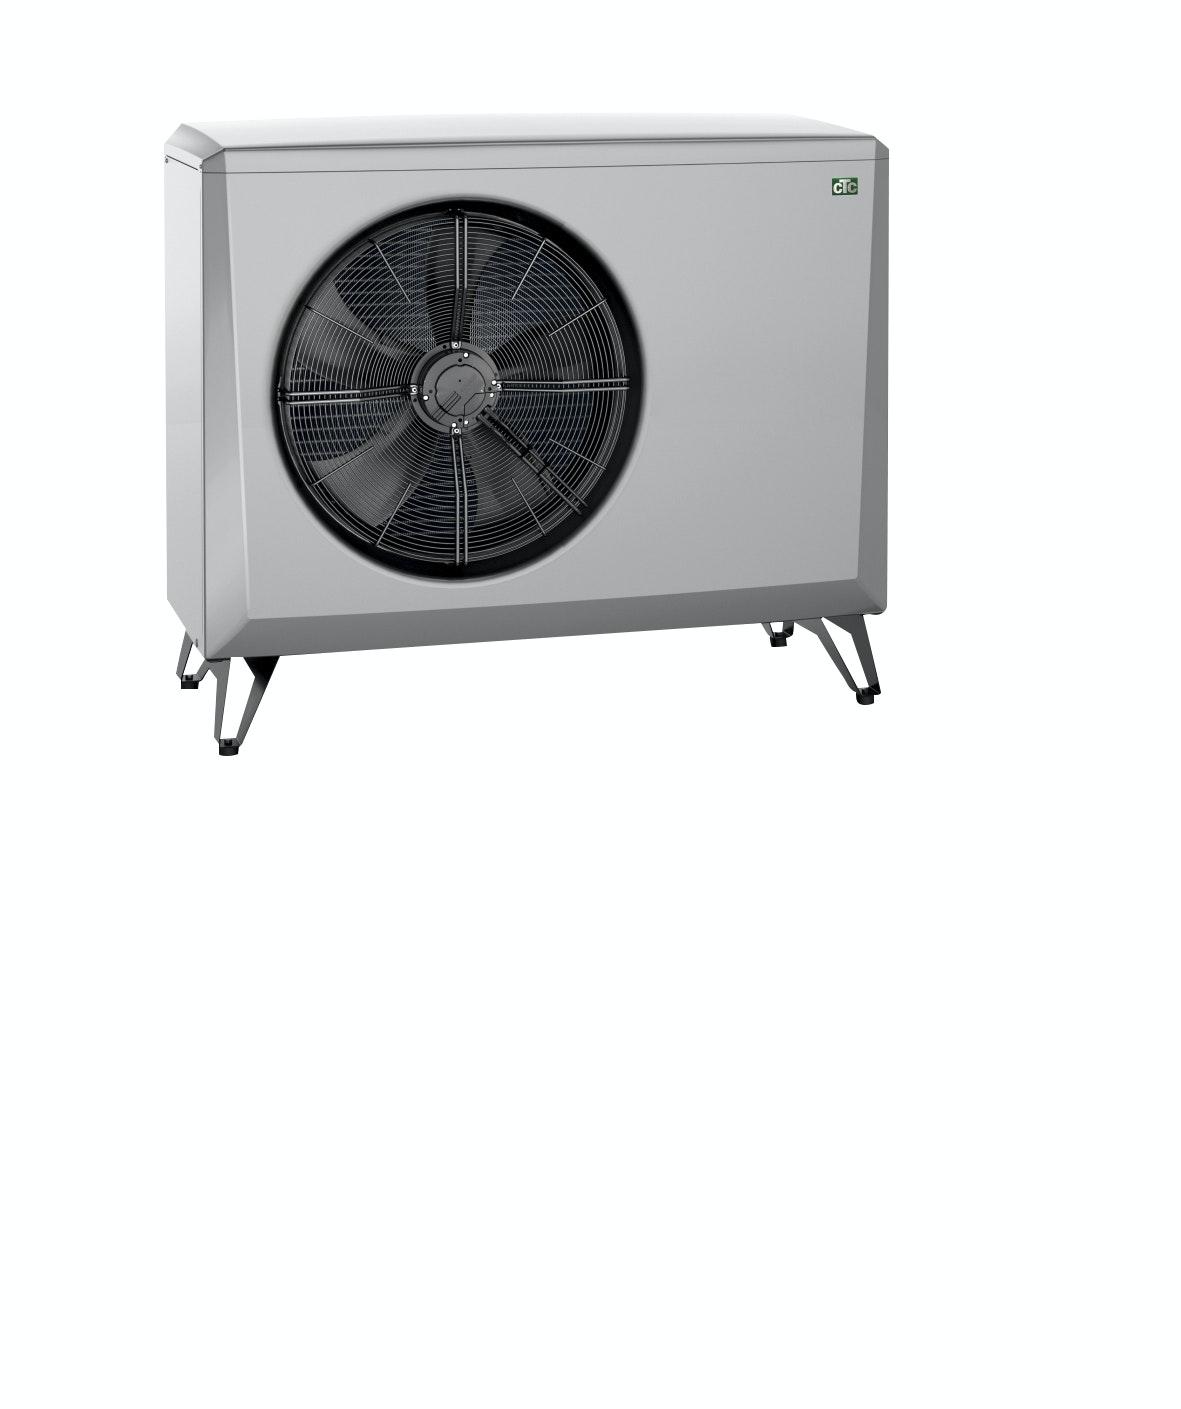 Luft-/Vattenvärmepump CTC Utedel Ecoair 410 A++